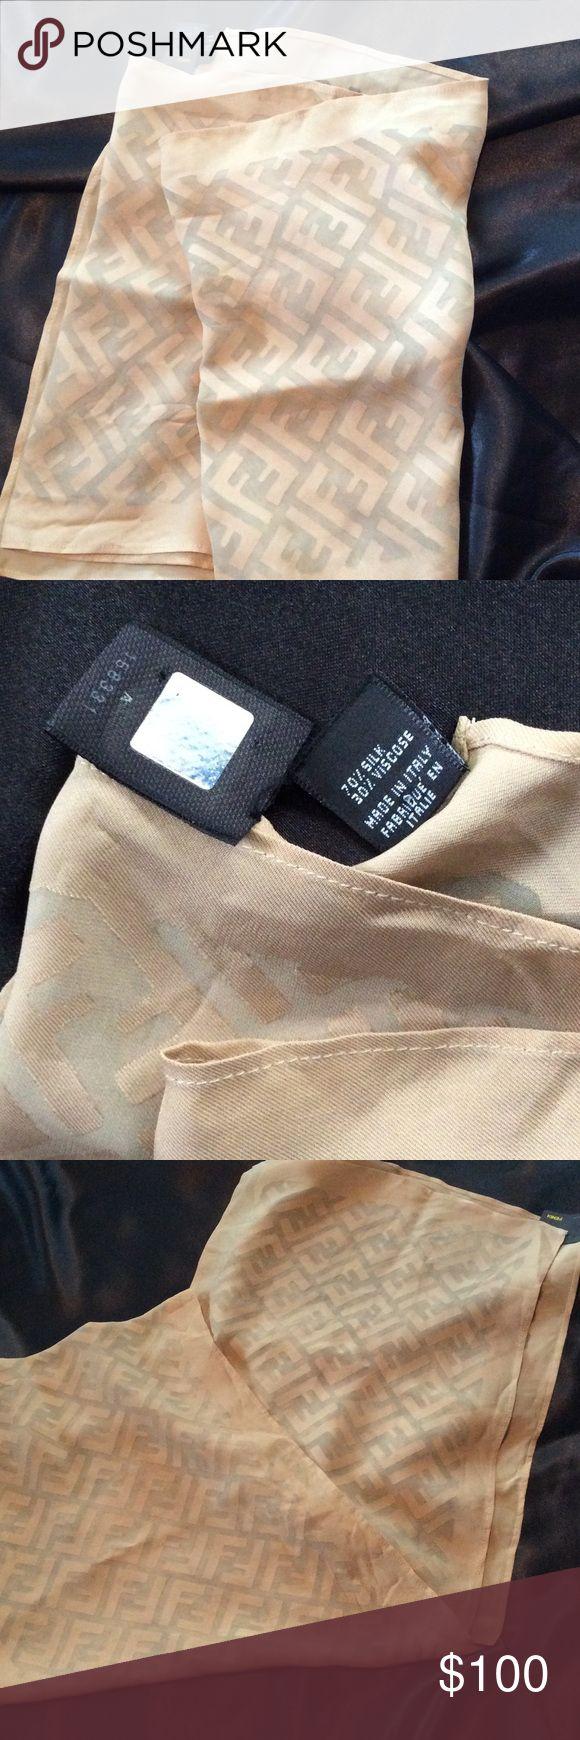 Authentic Fendi Scarf Beautiful Cream Fendi logo oblong silk and viscose scarf. New no tag Fendi Accessories Scarves & Wraps